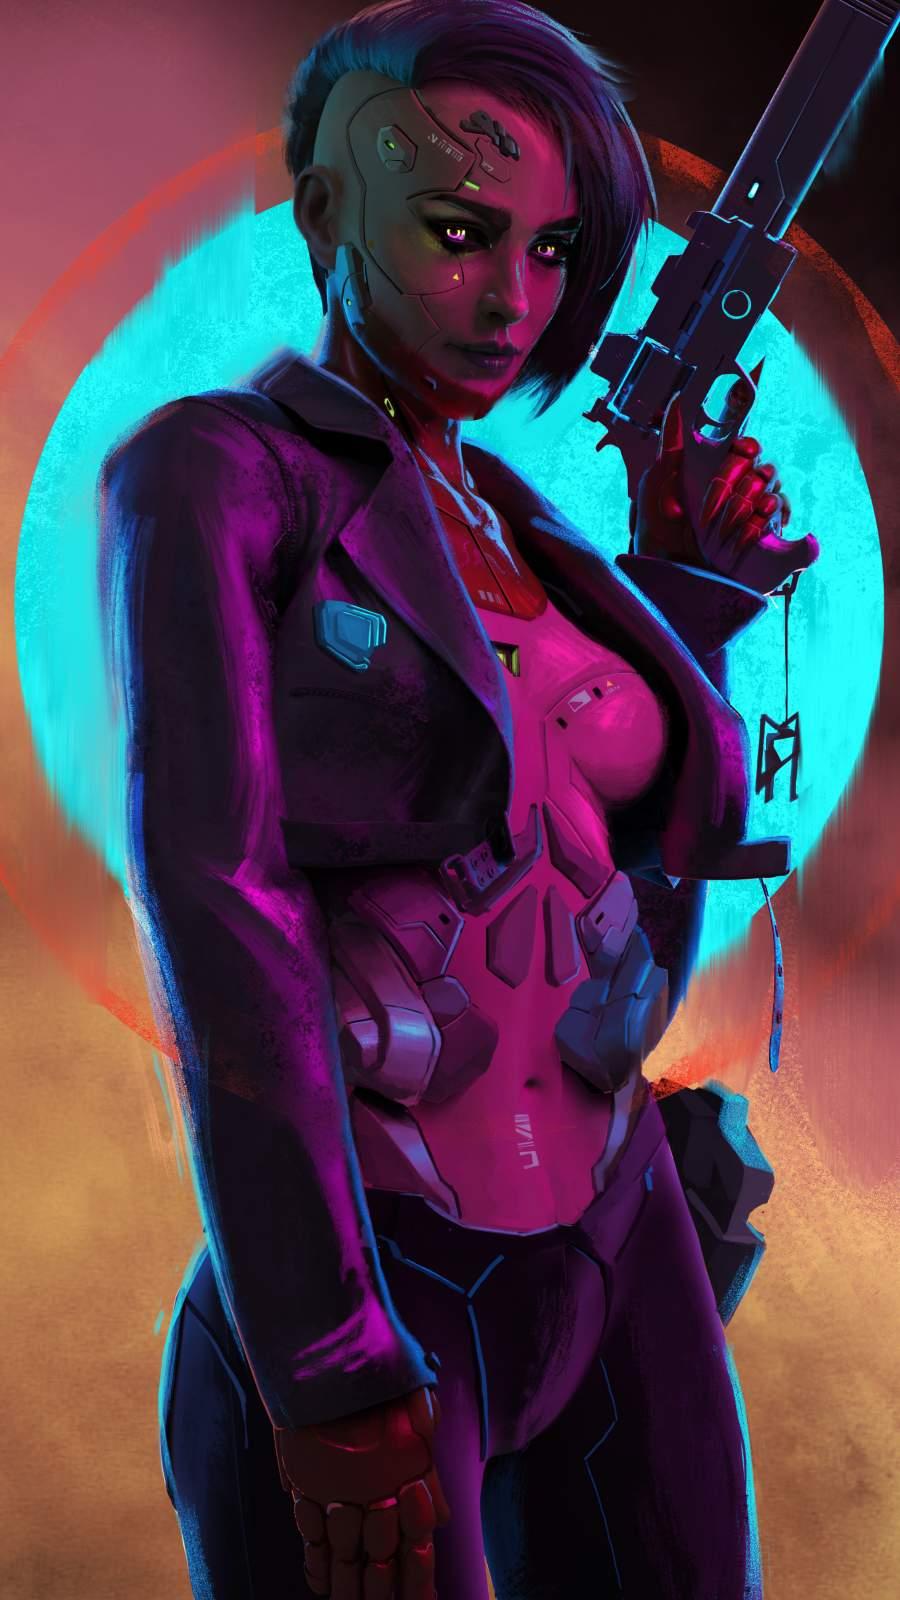 Cyborg Girl iPhone Wallpaper